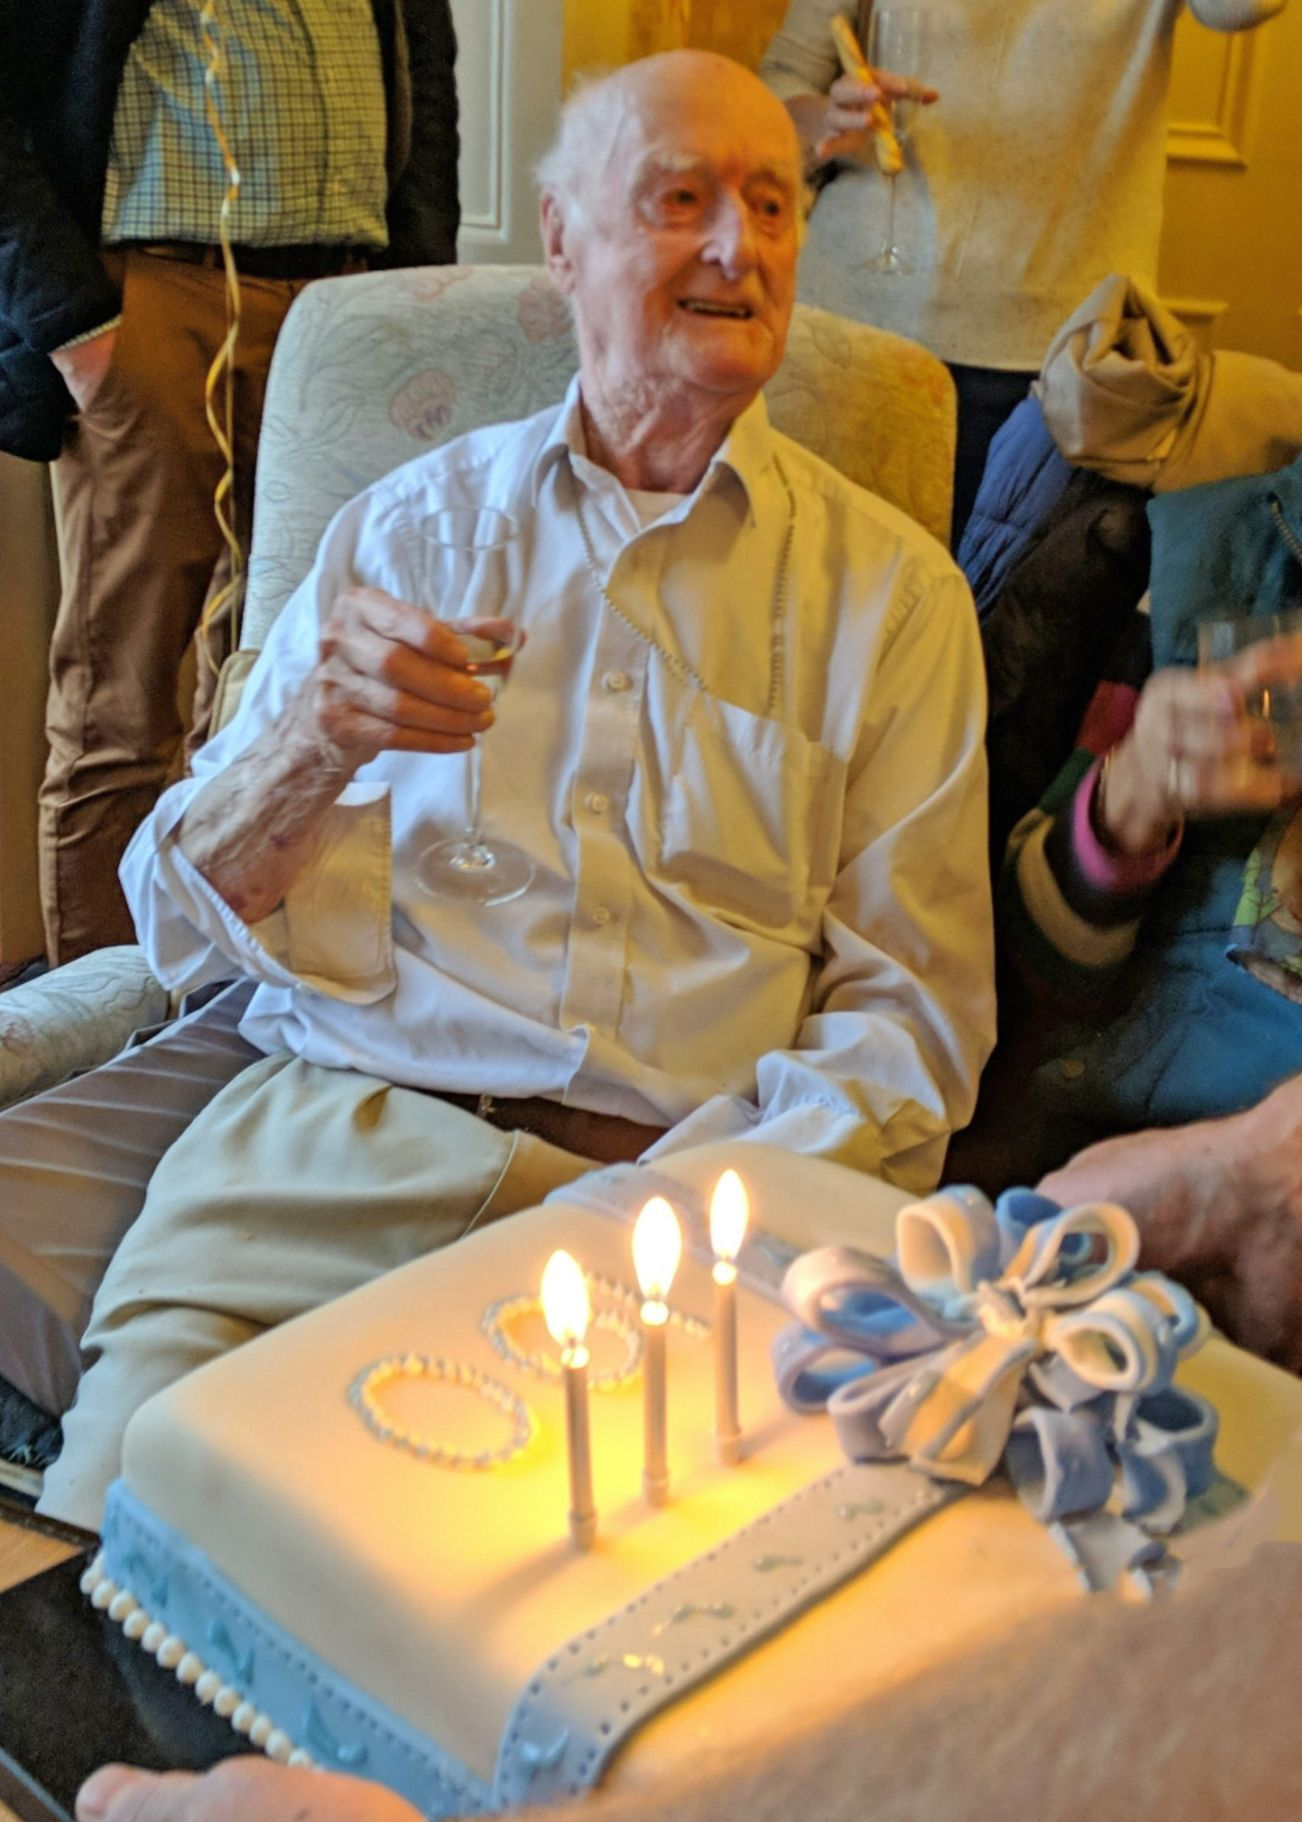 Elm Bank Care Home in Kettering celebrate John's 100th birthday